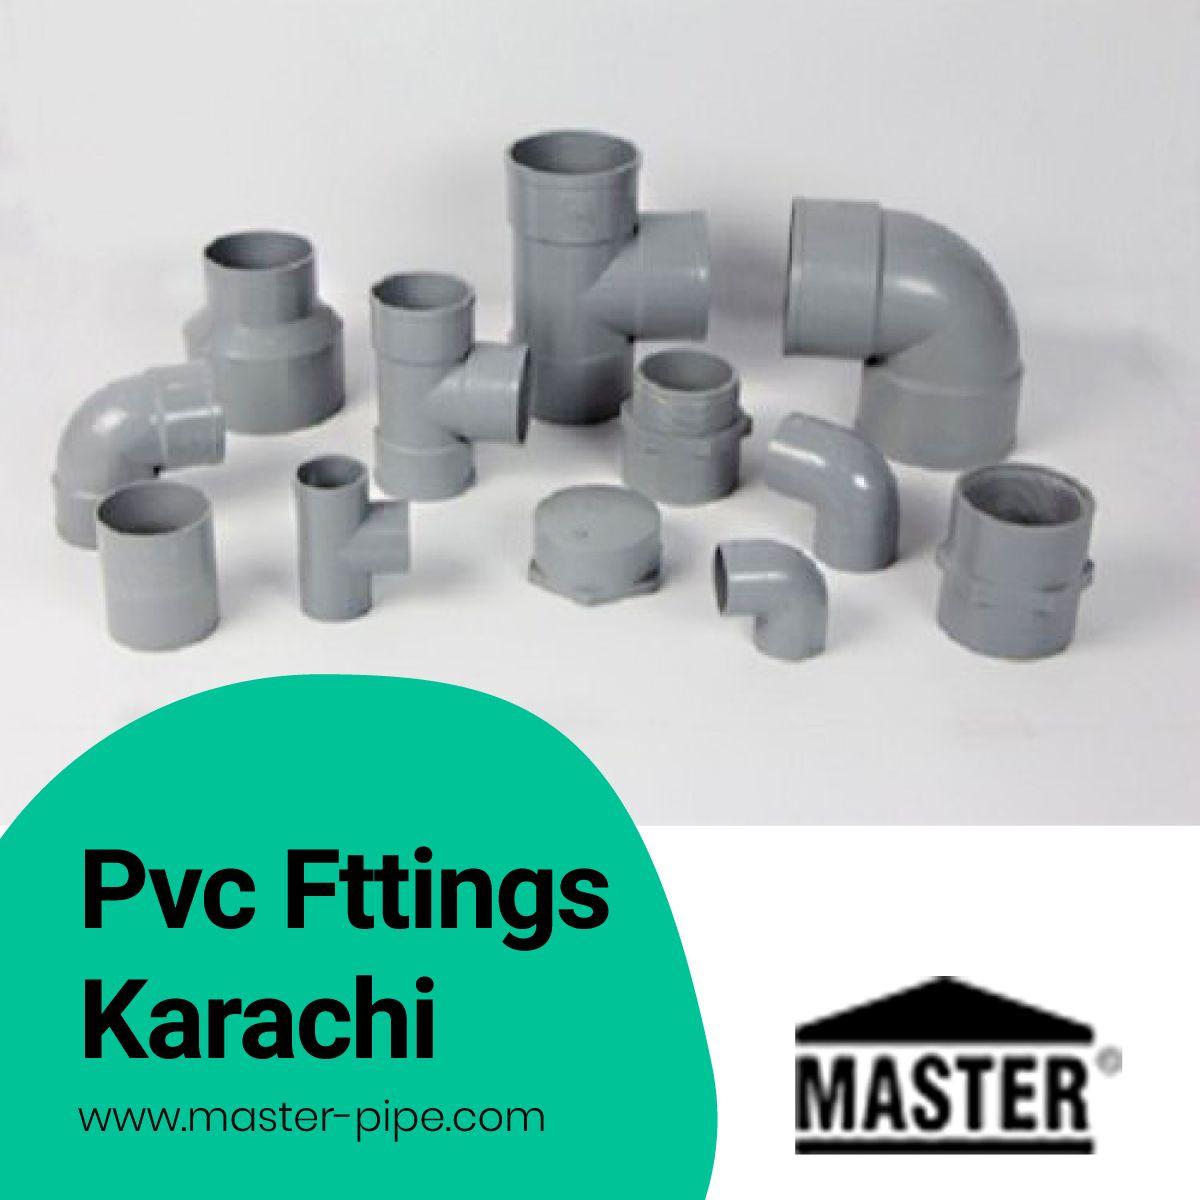 Pin On Pvc Fittings Karachi